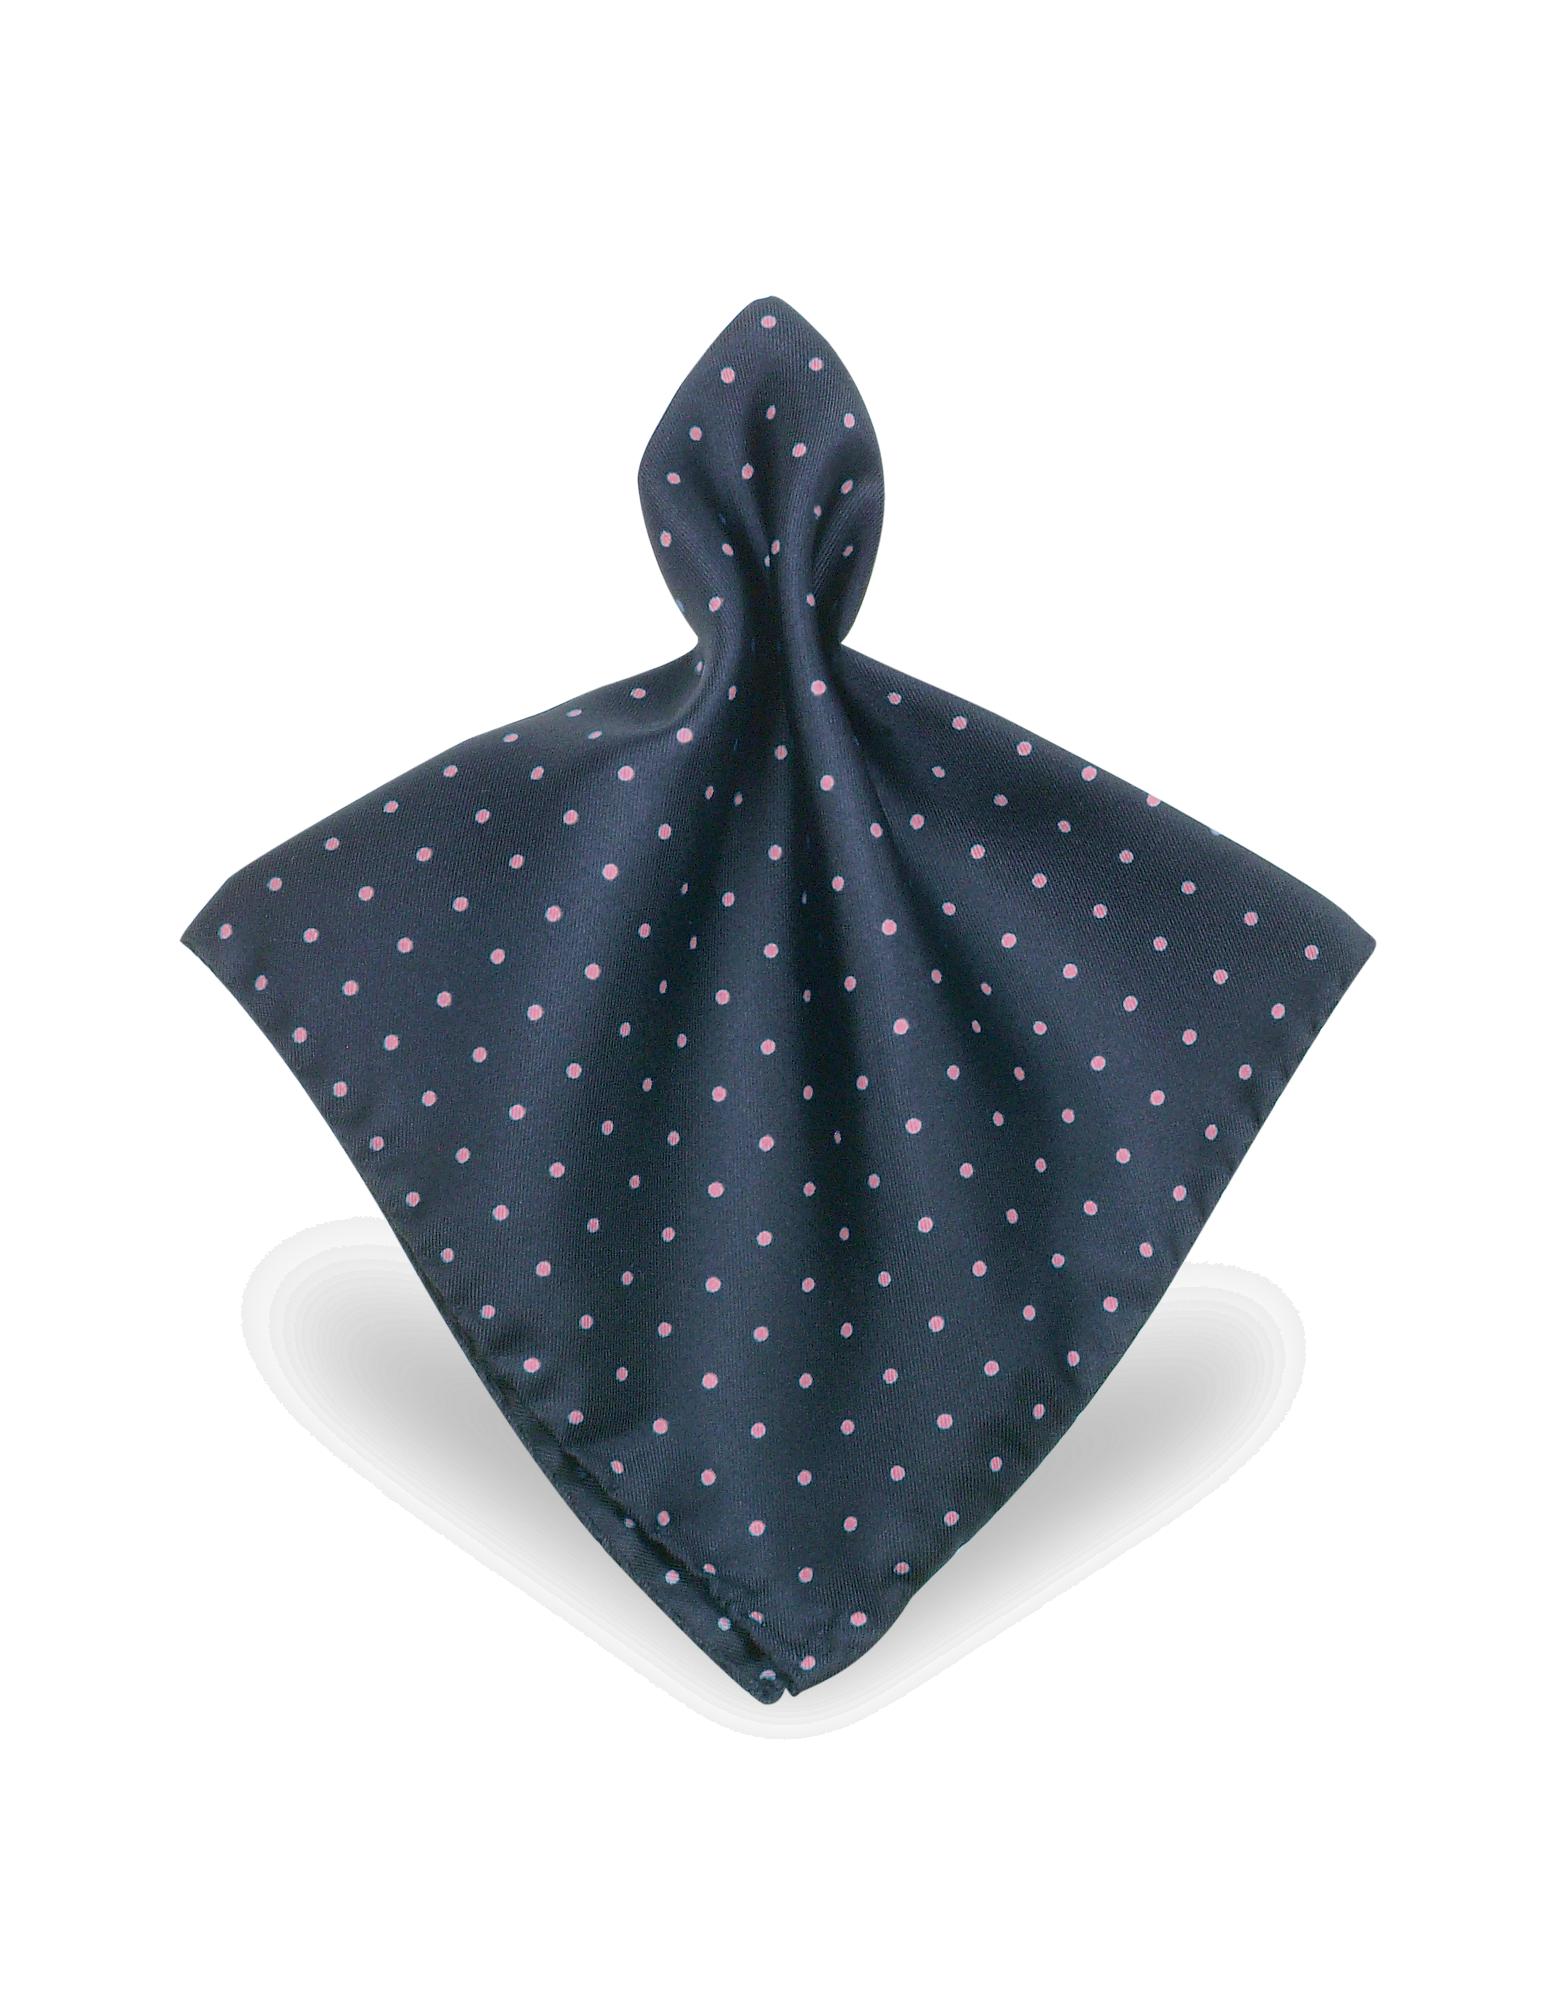 Image of Polkadot Twill Silk Pocket Square